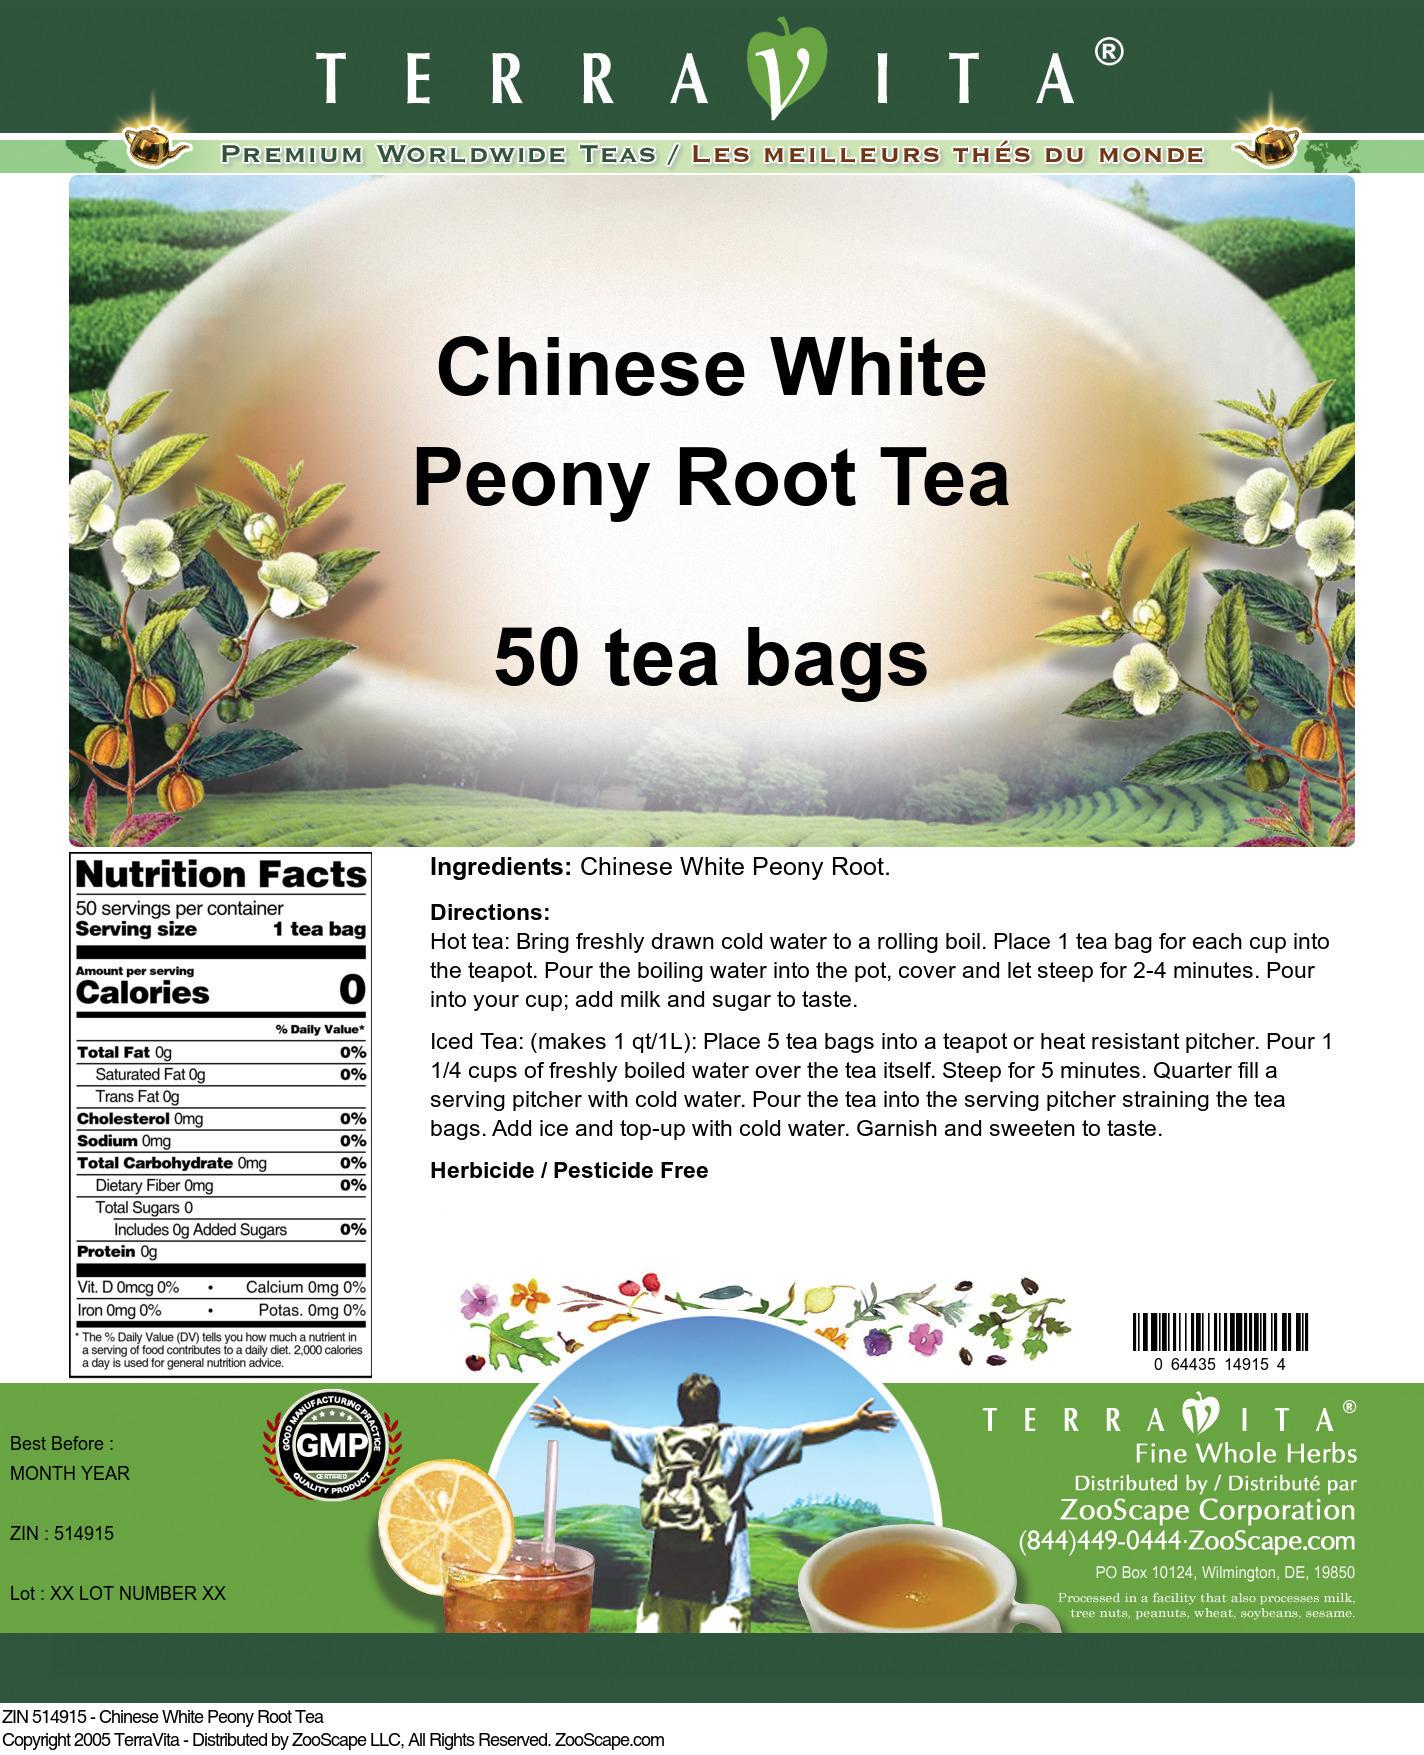 Chinese White Peony Root Tea